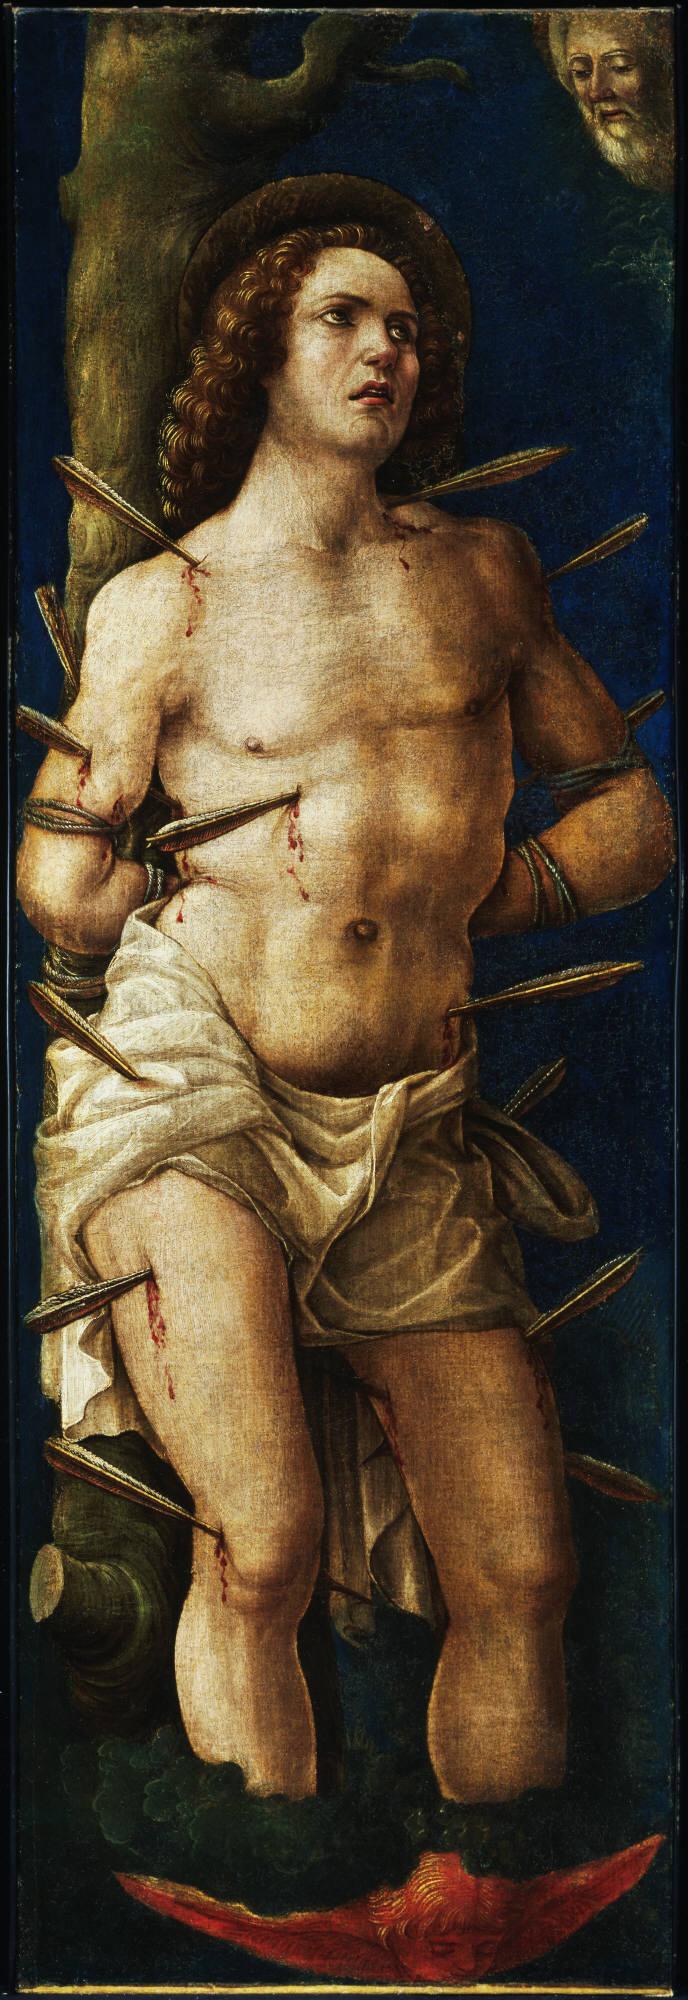 Liberale da Verona, Italian, 1445–1527/29 Saint Sebastian ca. 1480 or later